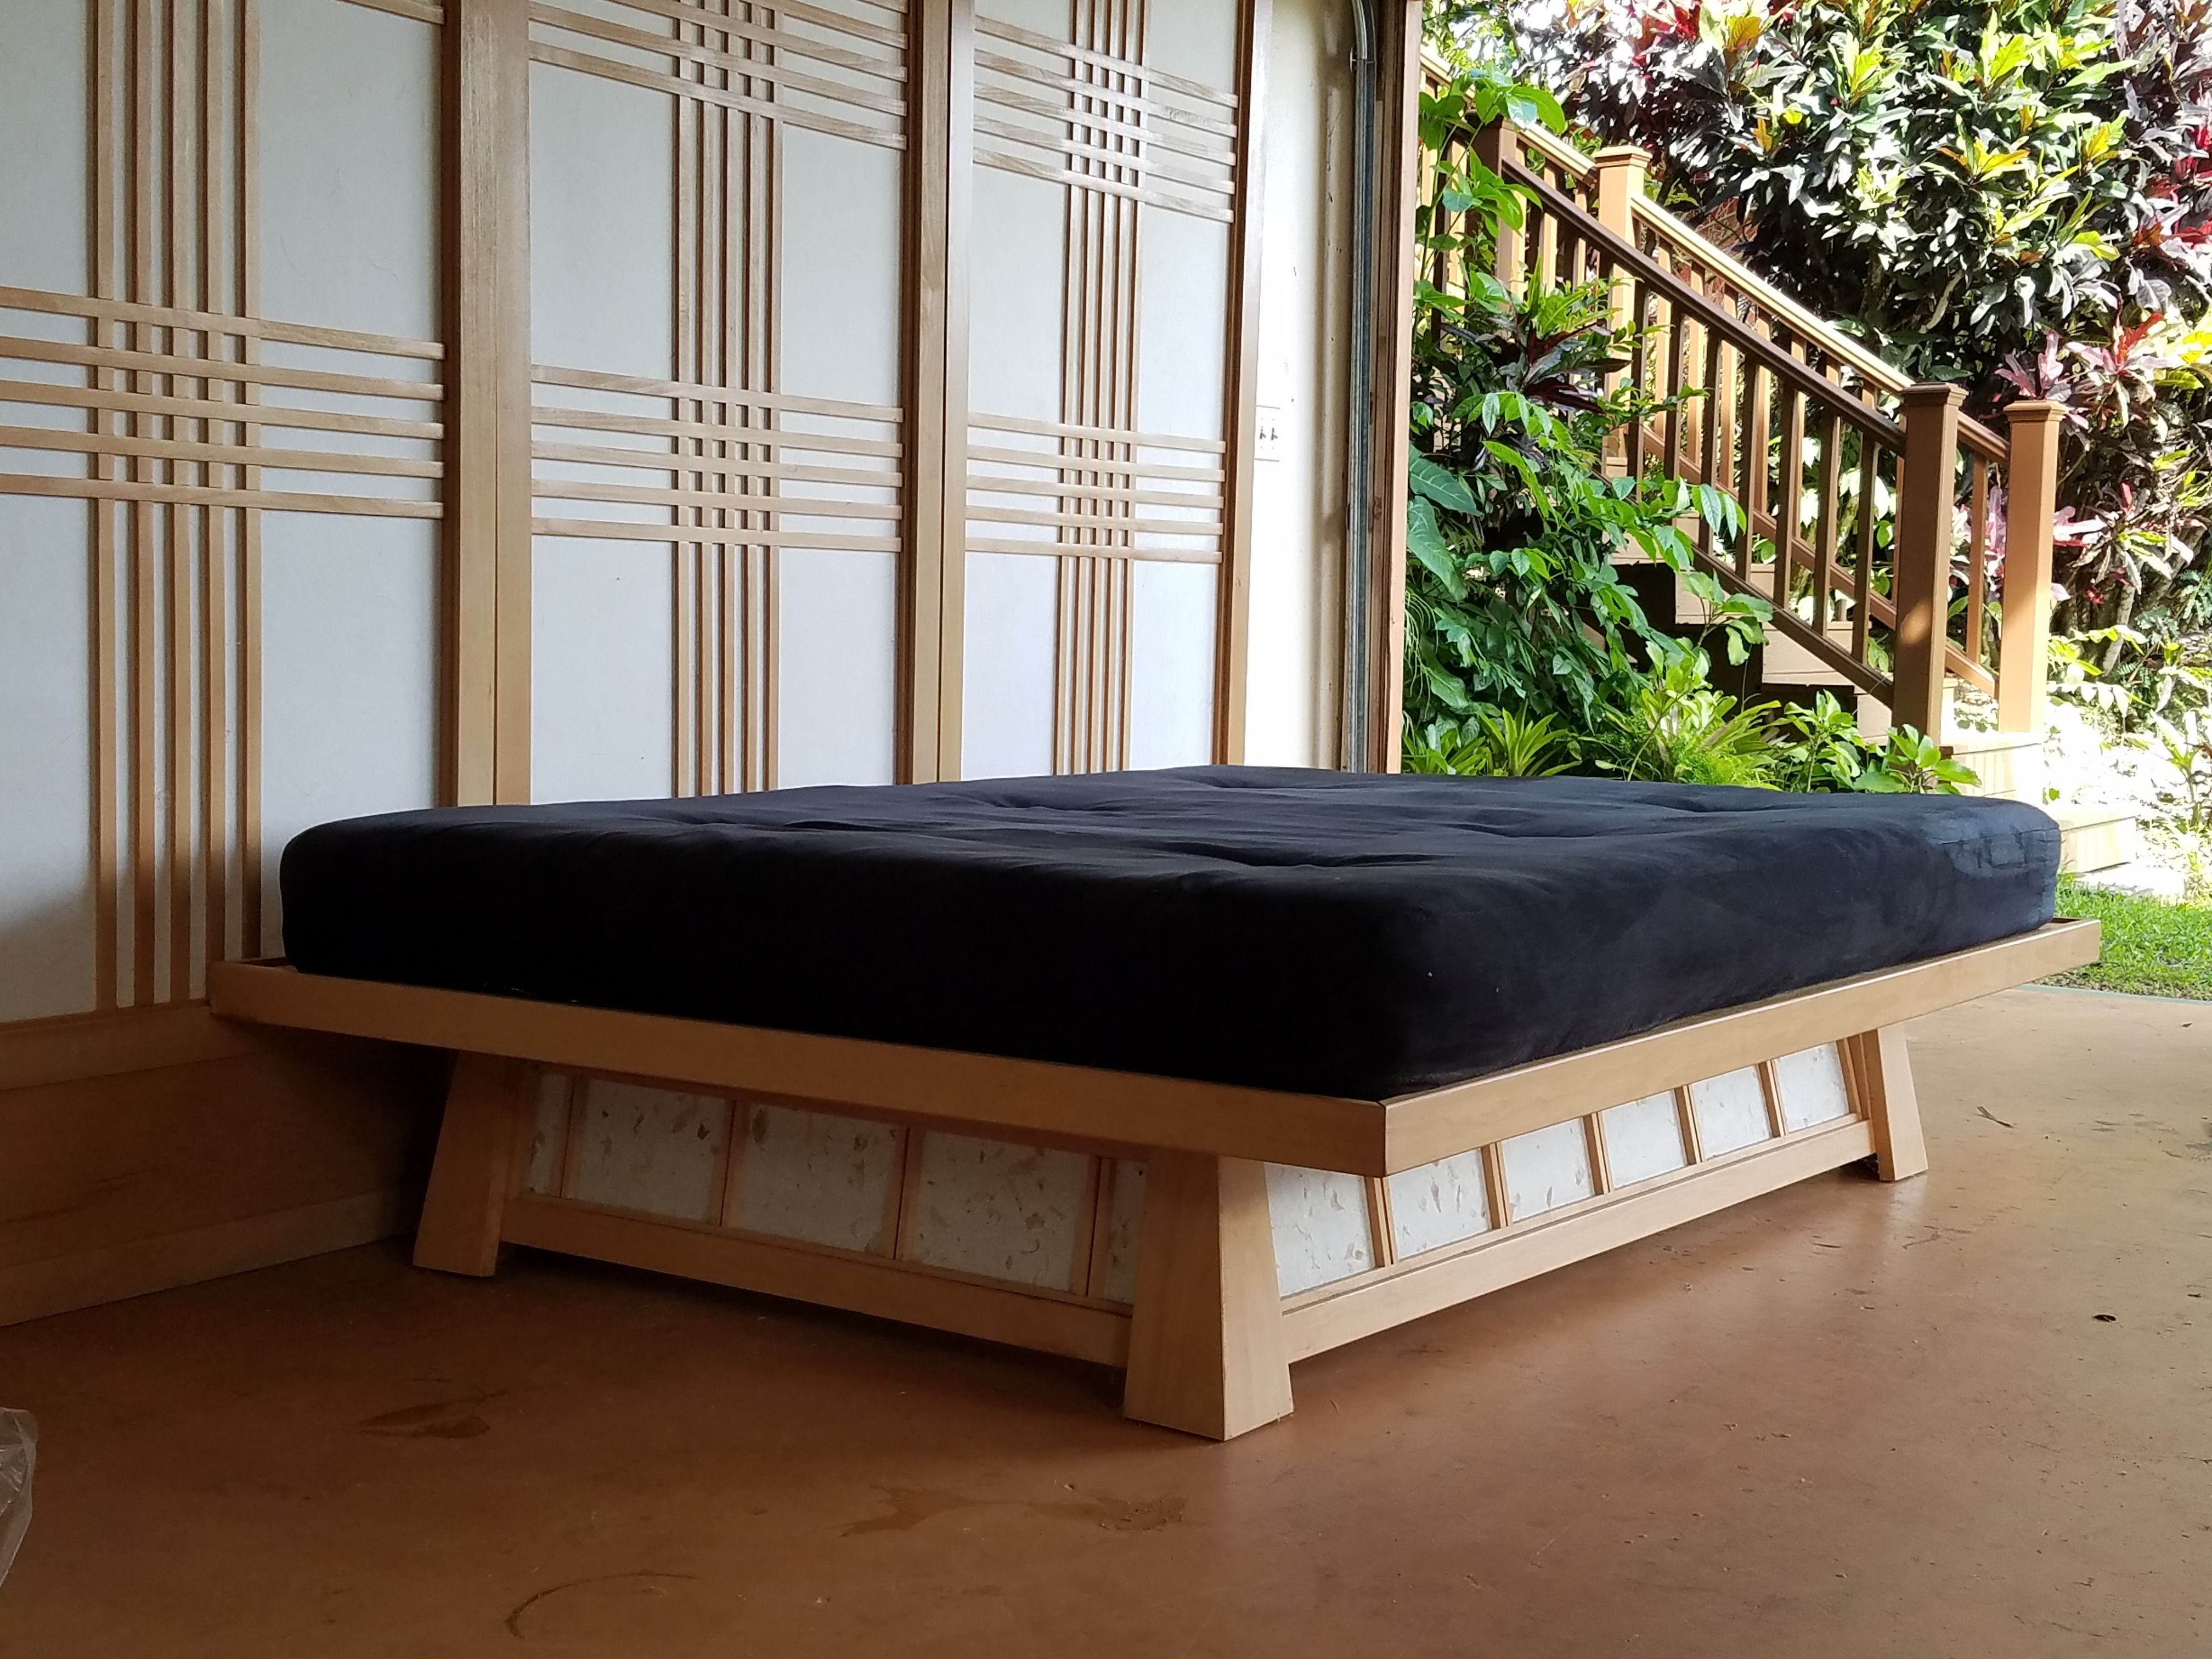 Floating platform bed with